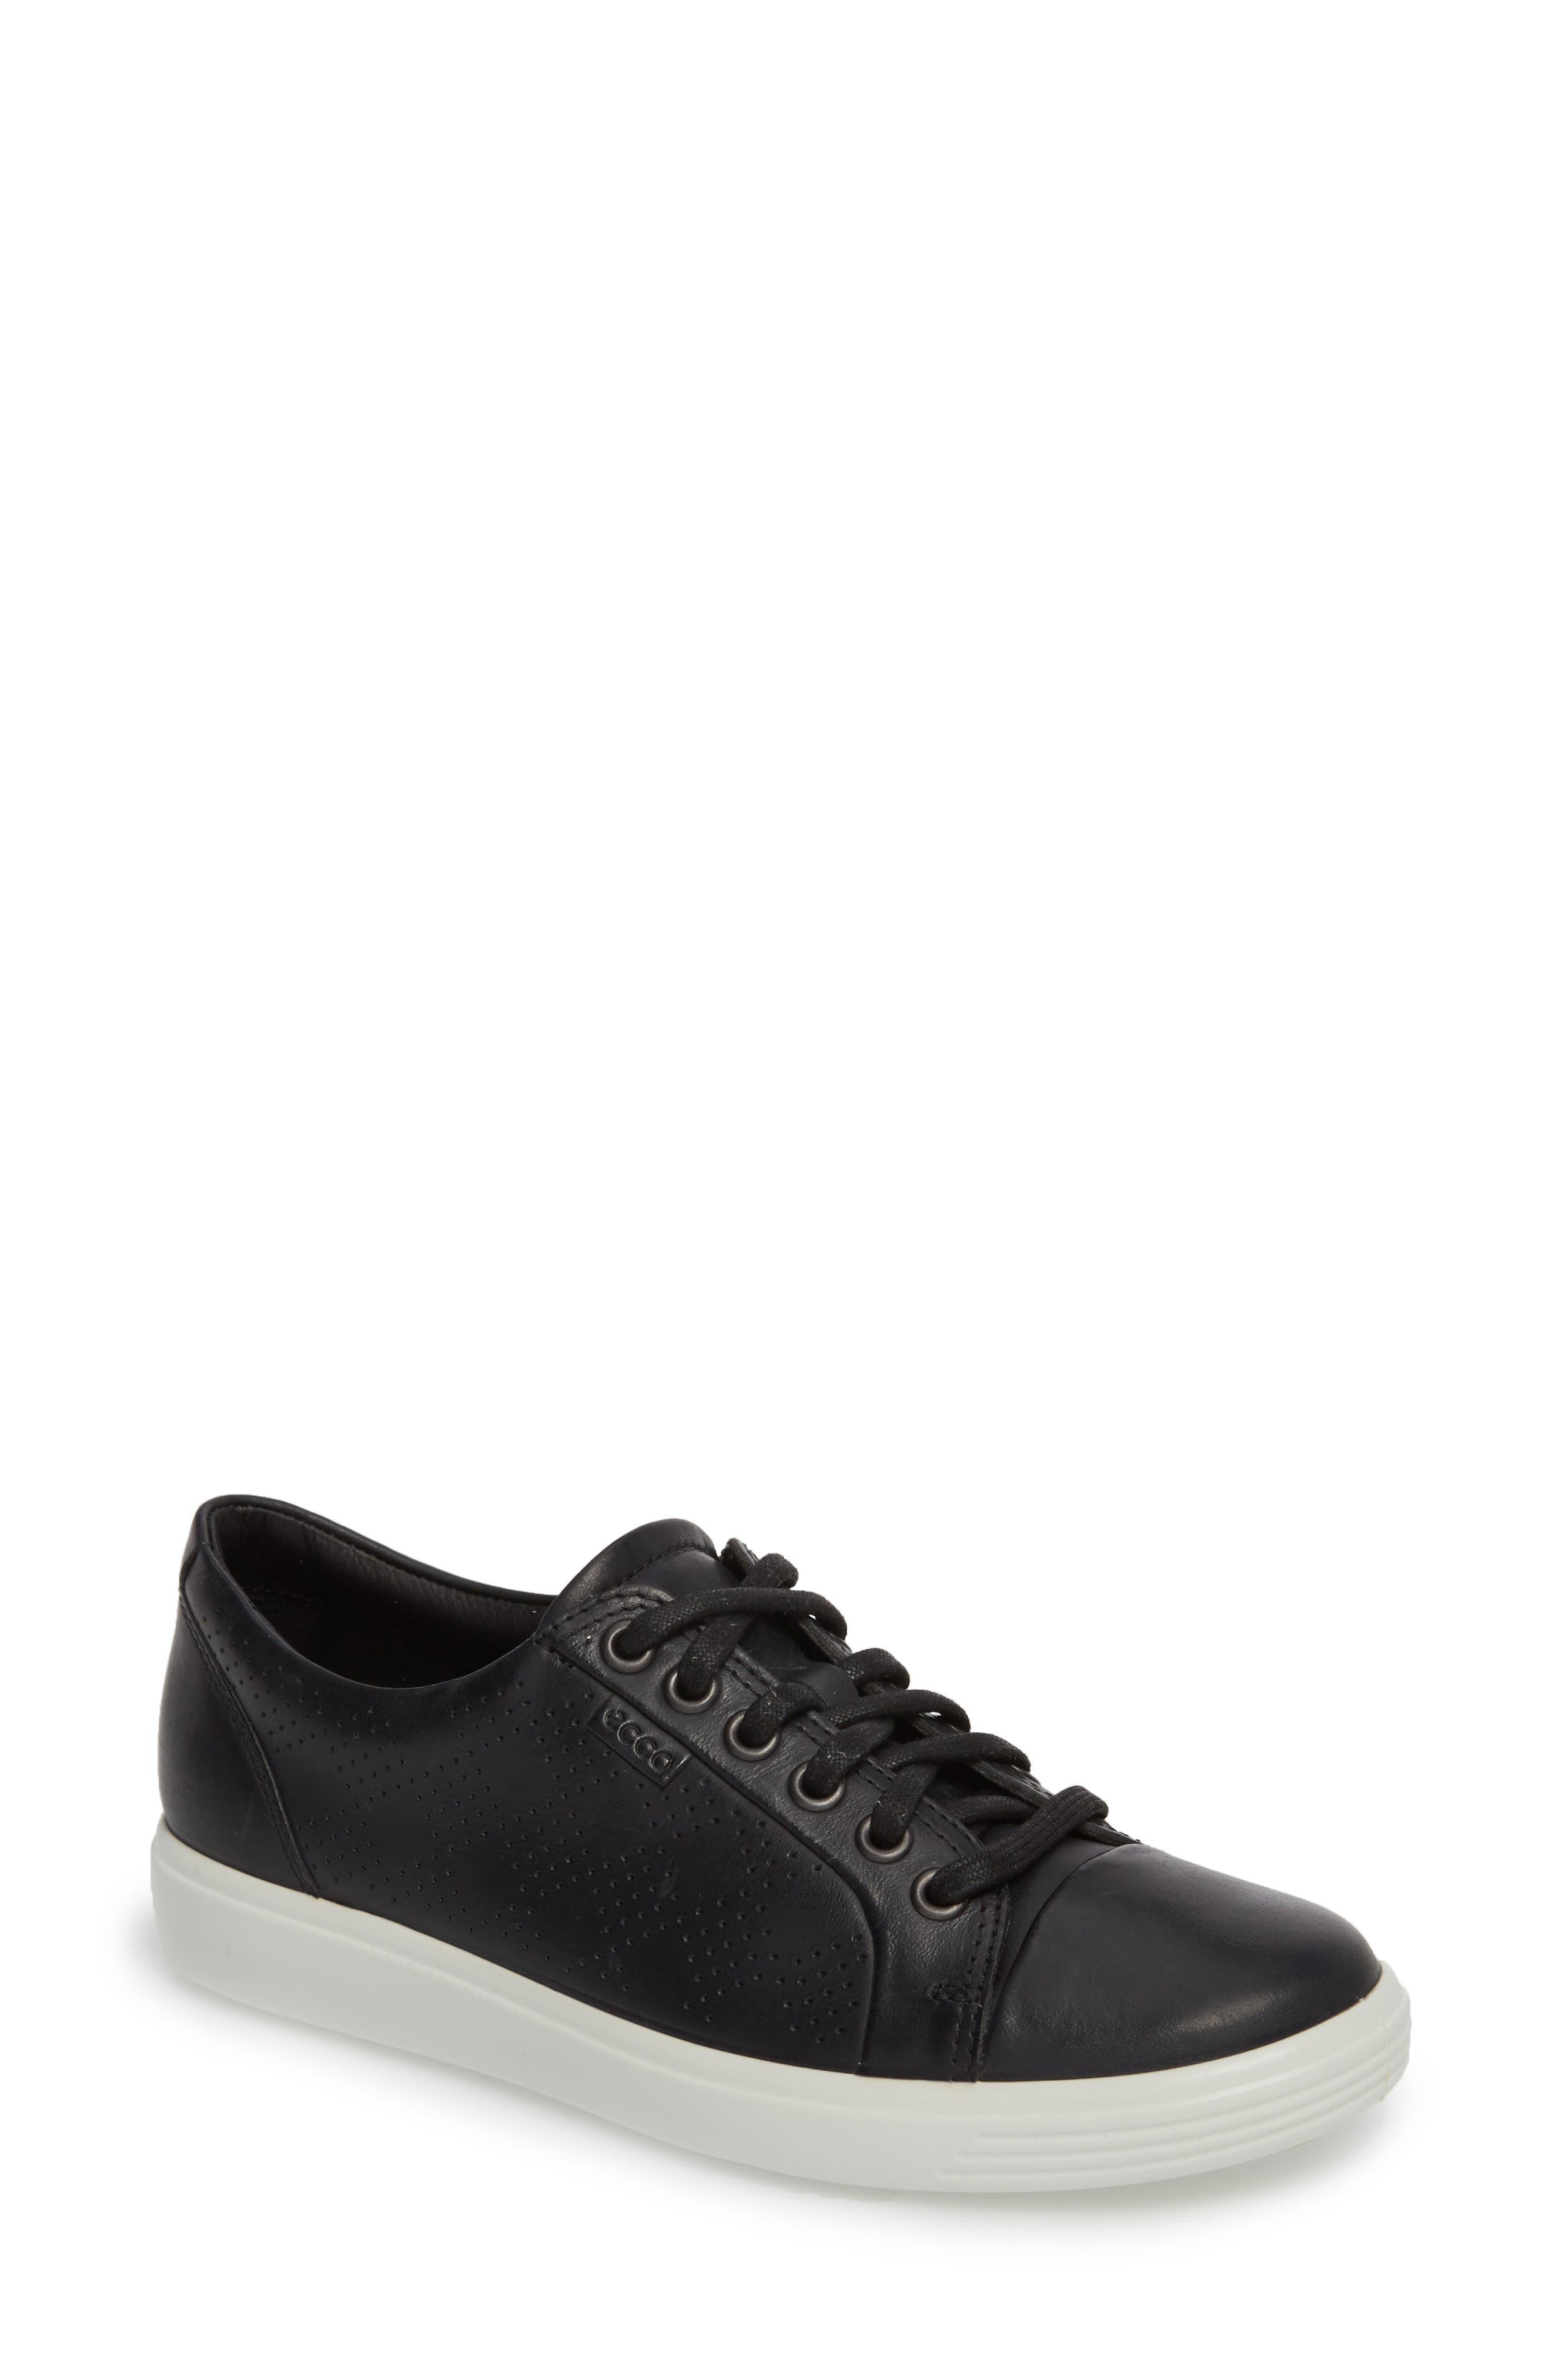 Soft 7 Sneaker,                             Main thumbnail 1, color,                             BLACK LEATHER